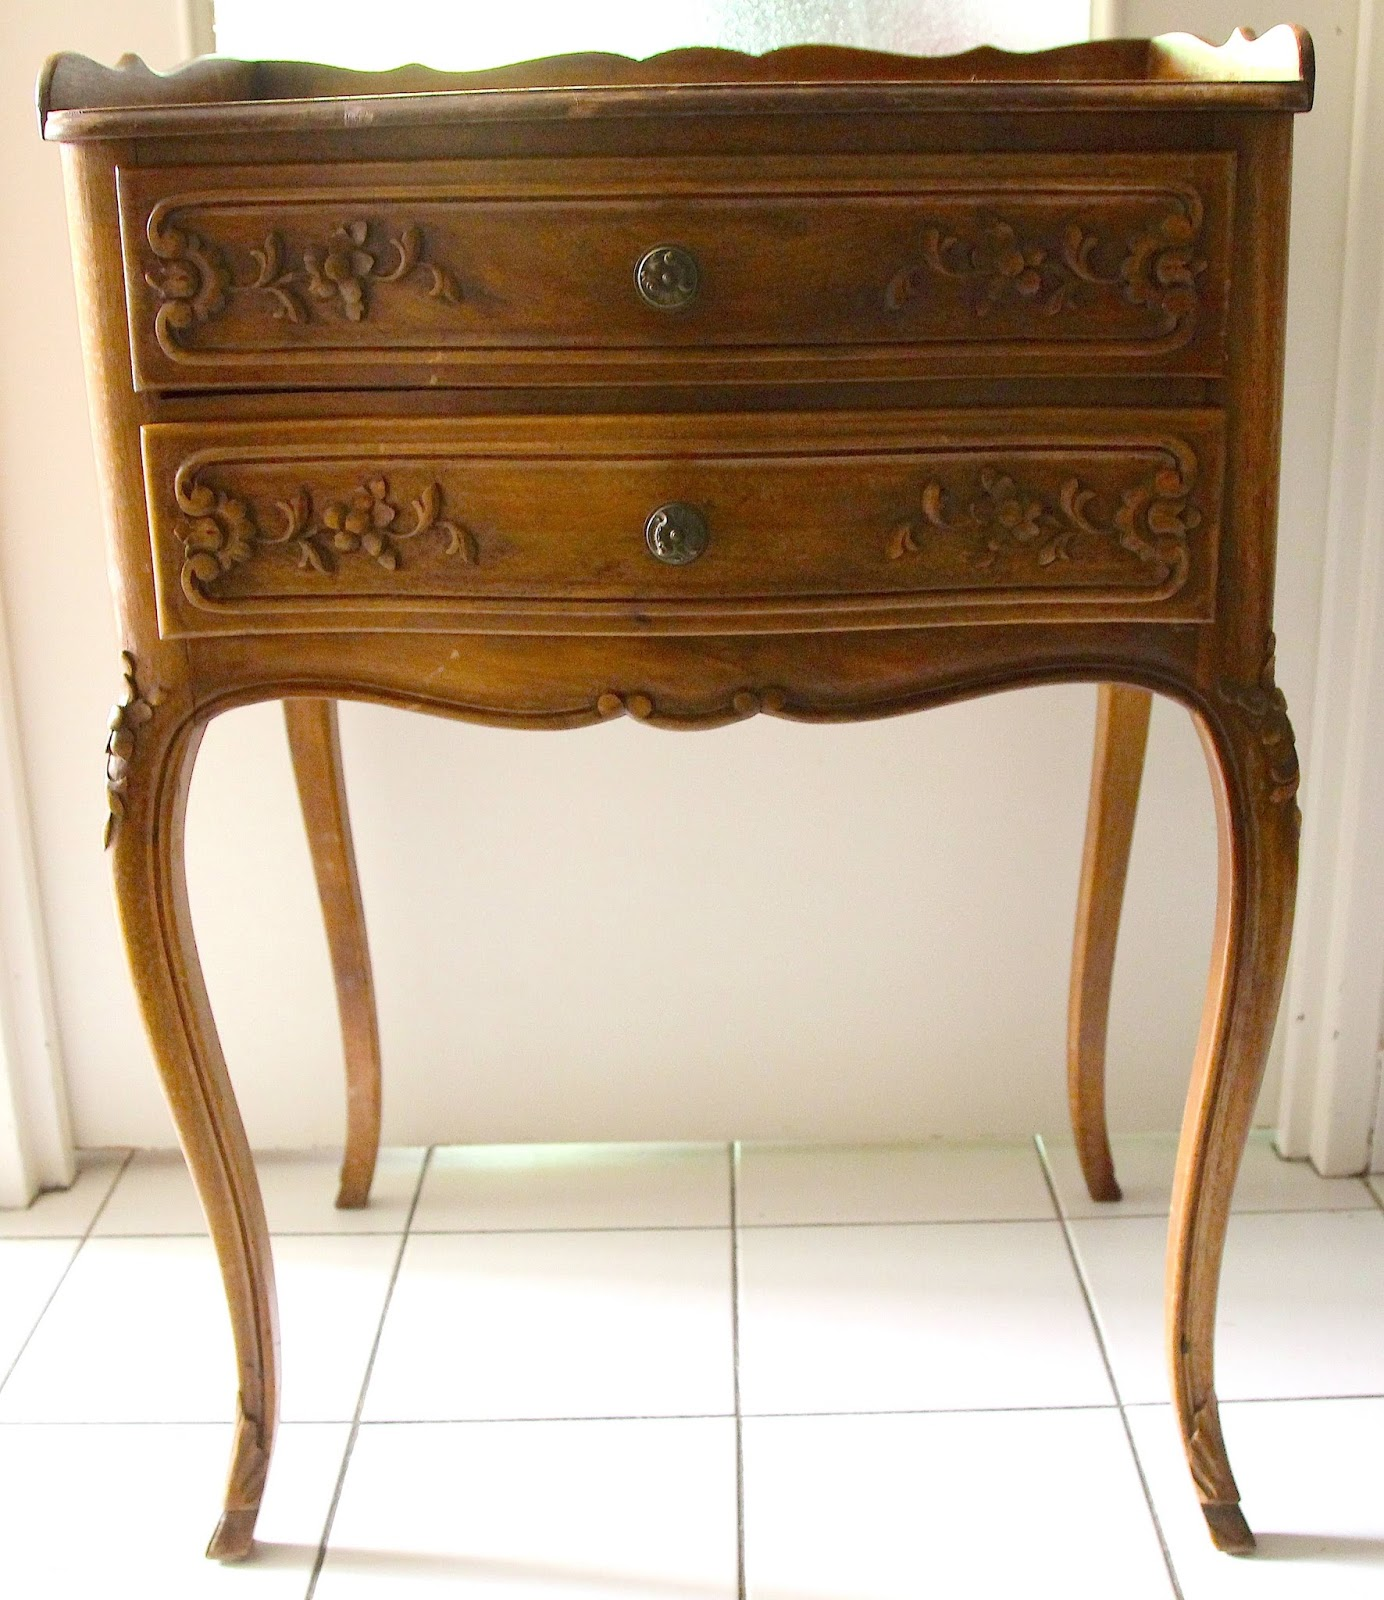 diy r nover une table de nuit kitty crumpets. Black Bedroom Furniture Sets. Home Design Ideas